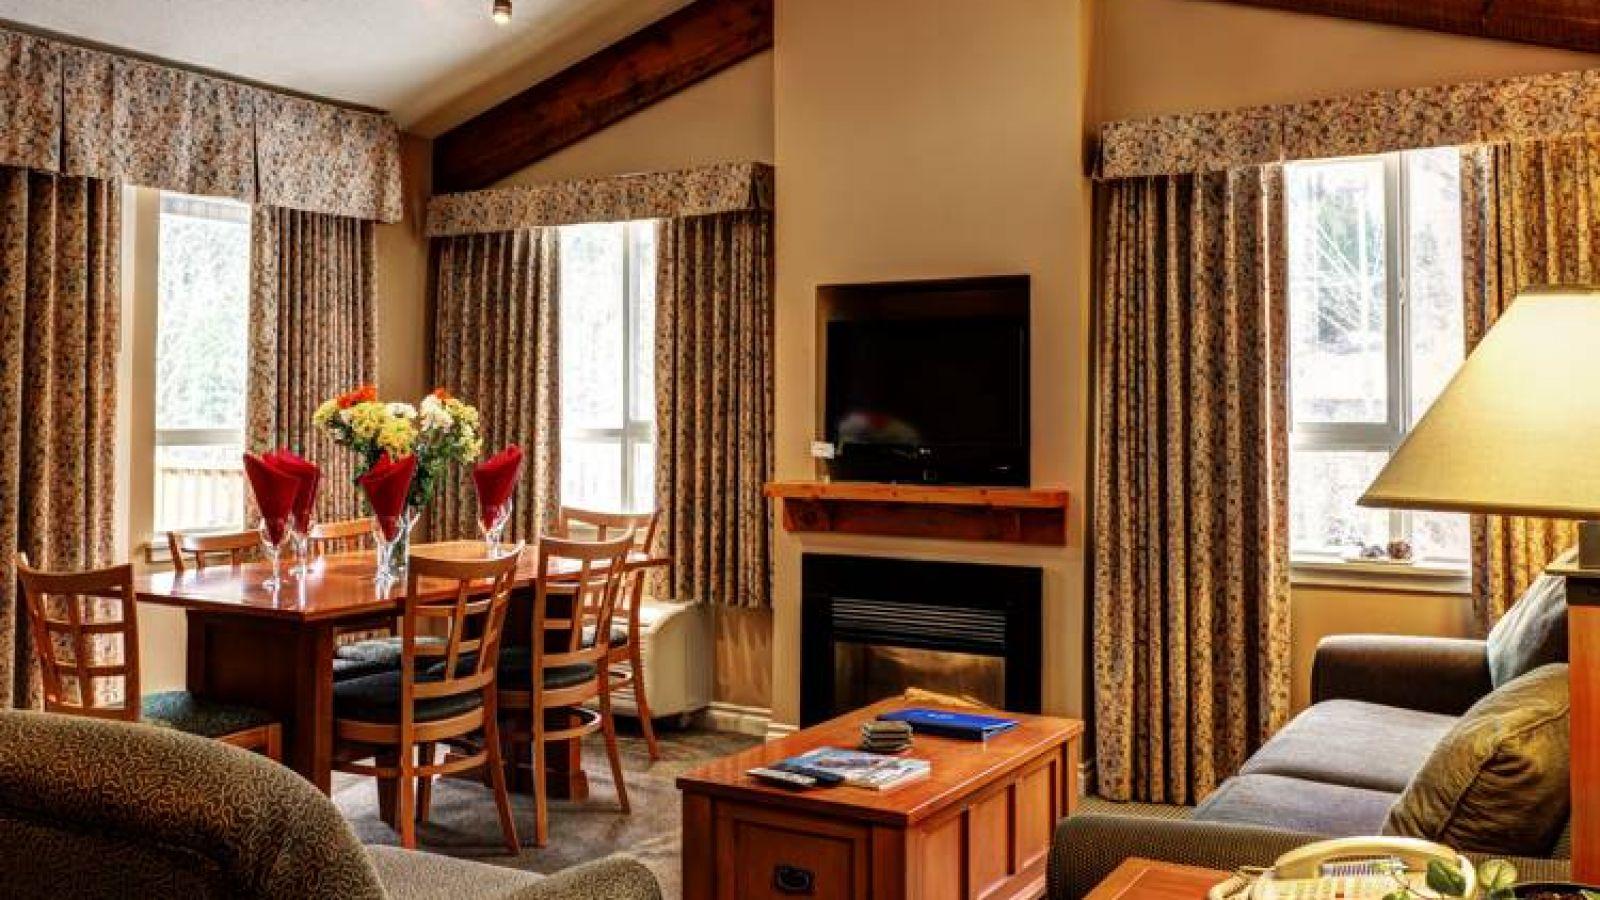 Pemberton Valley Lodge - 2 bedroom living room area